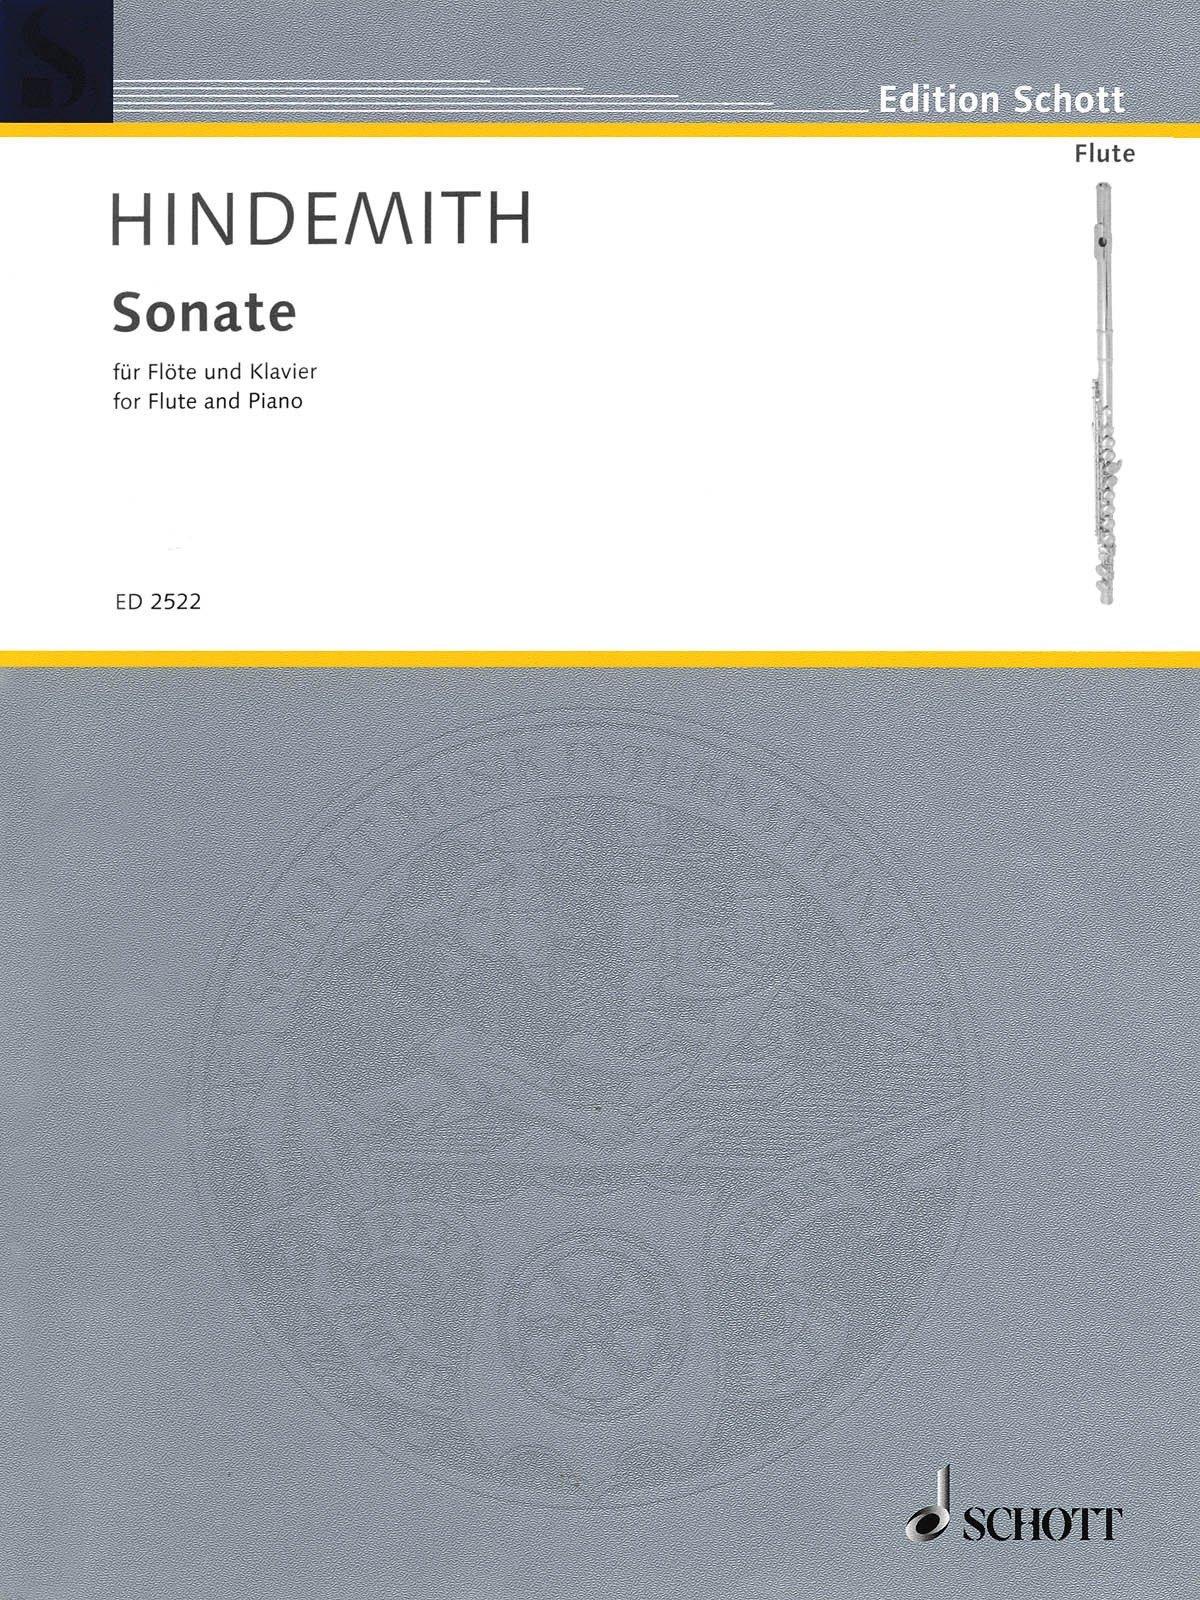 hindemith-flute-sonata